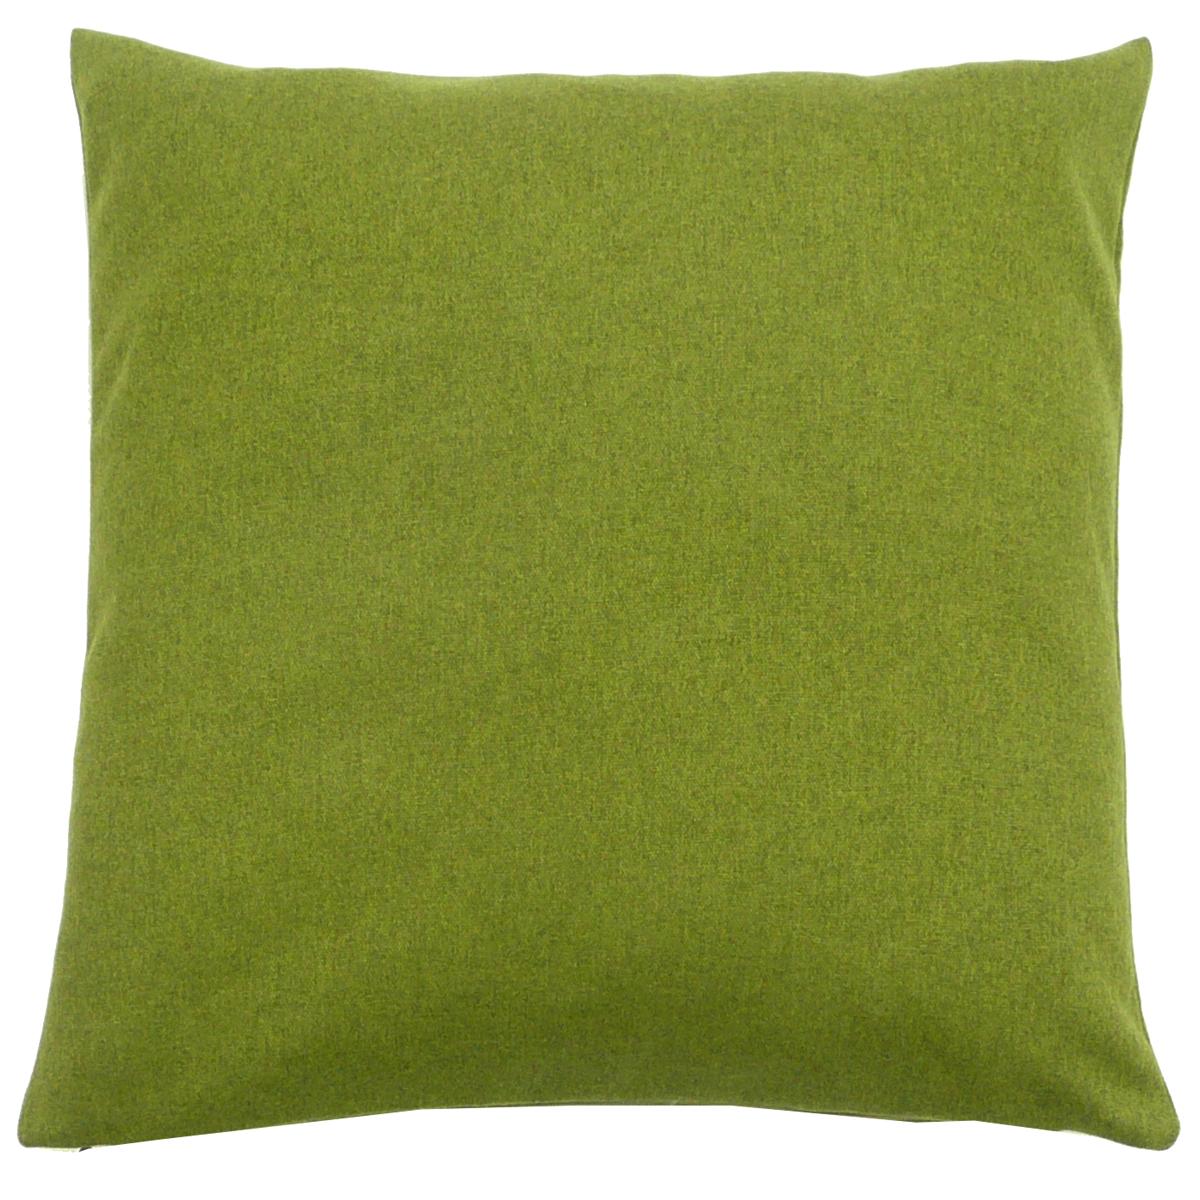 kissenh lle filzo filzstoff gr n meliert 50x50cm. Black Bedroom Furniture Sets. Home Design Ideas